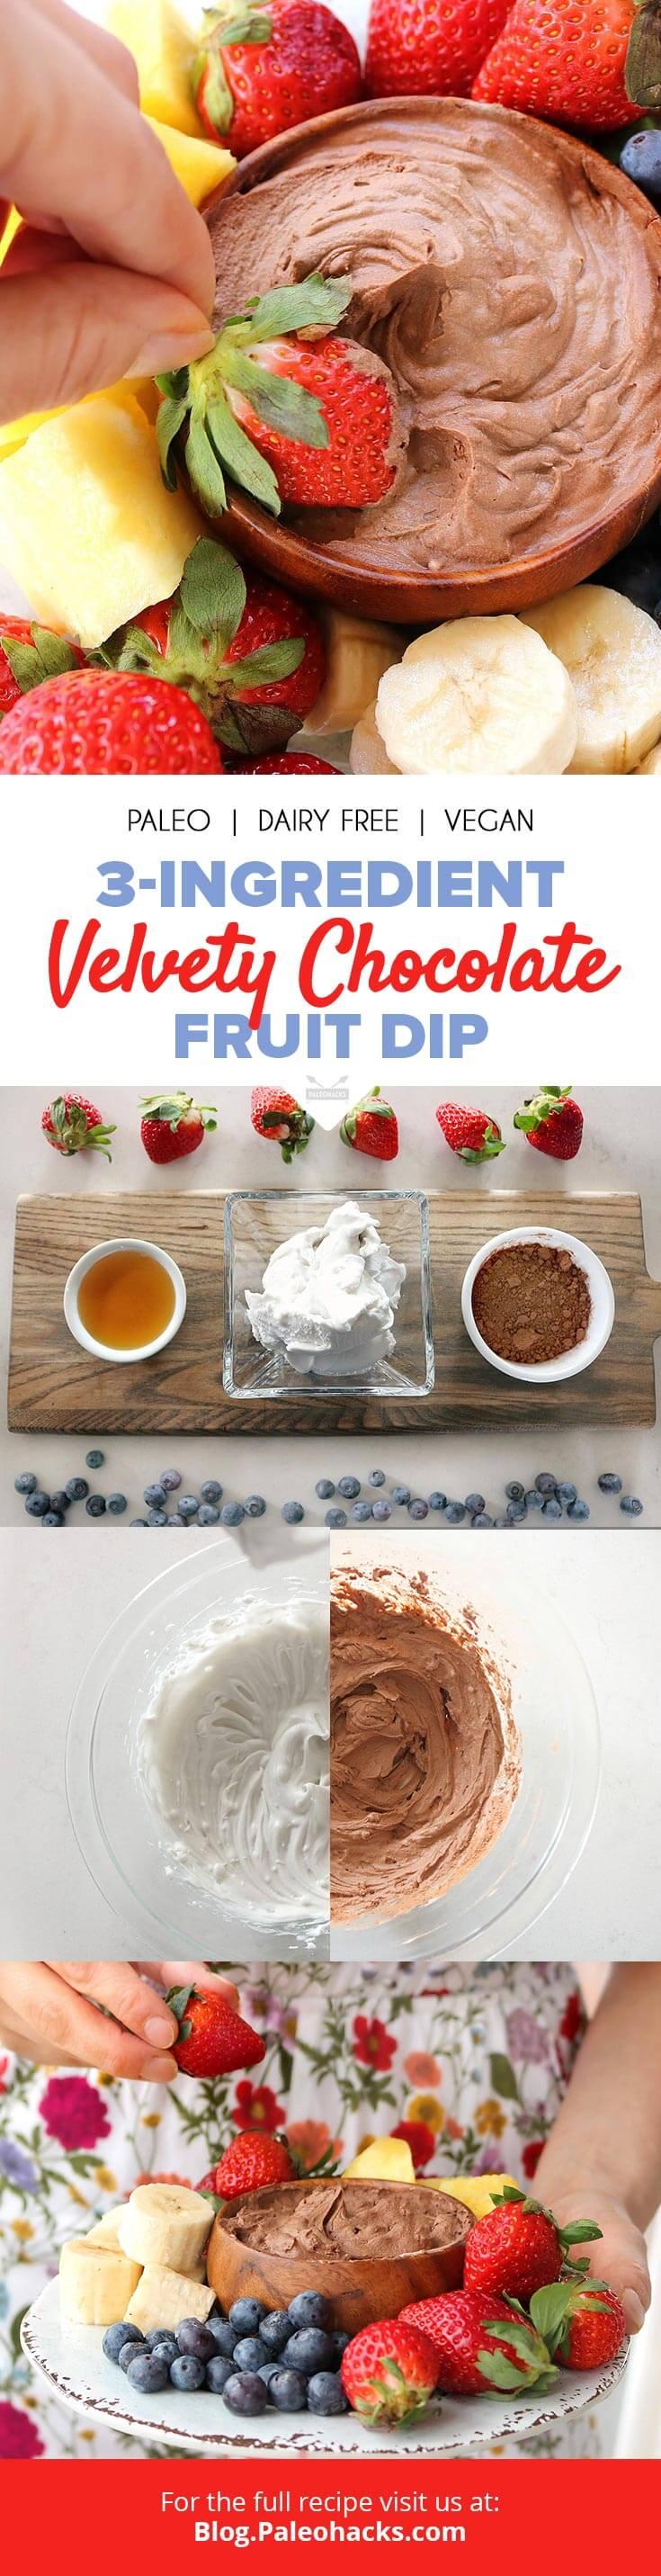 3-Ingredient Velvety Chocolate Fruit Dip | Raw, Paleo, Vegan